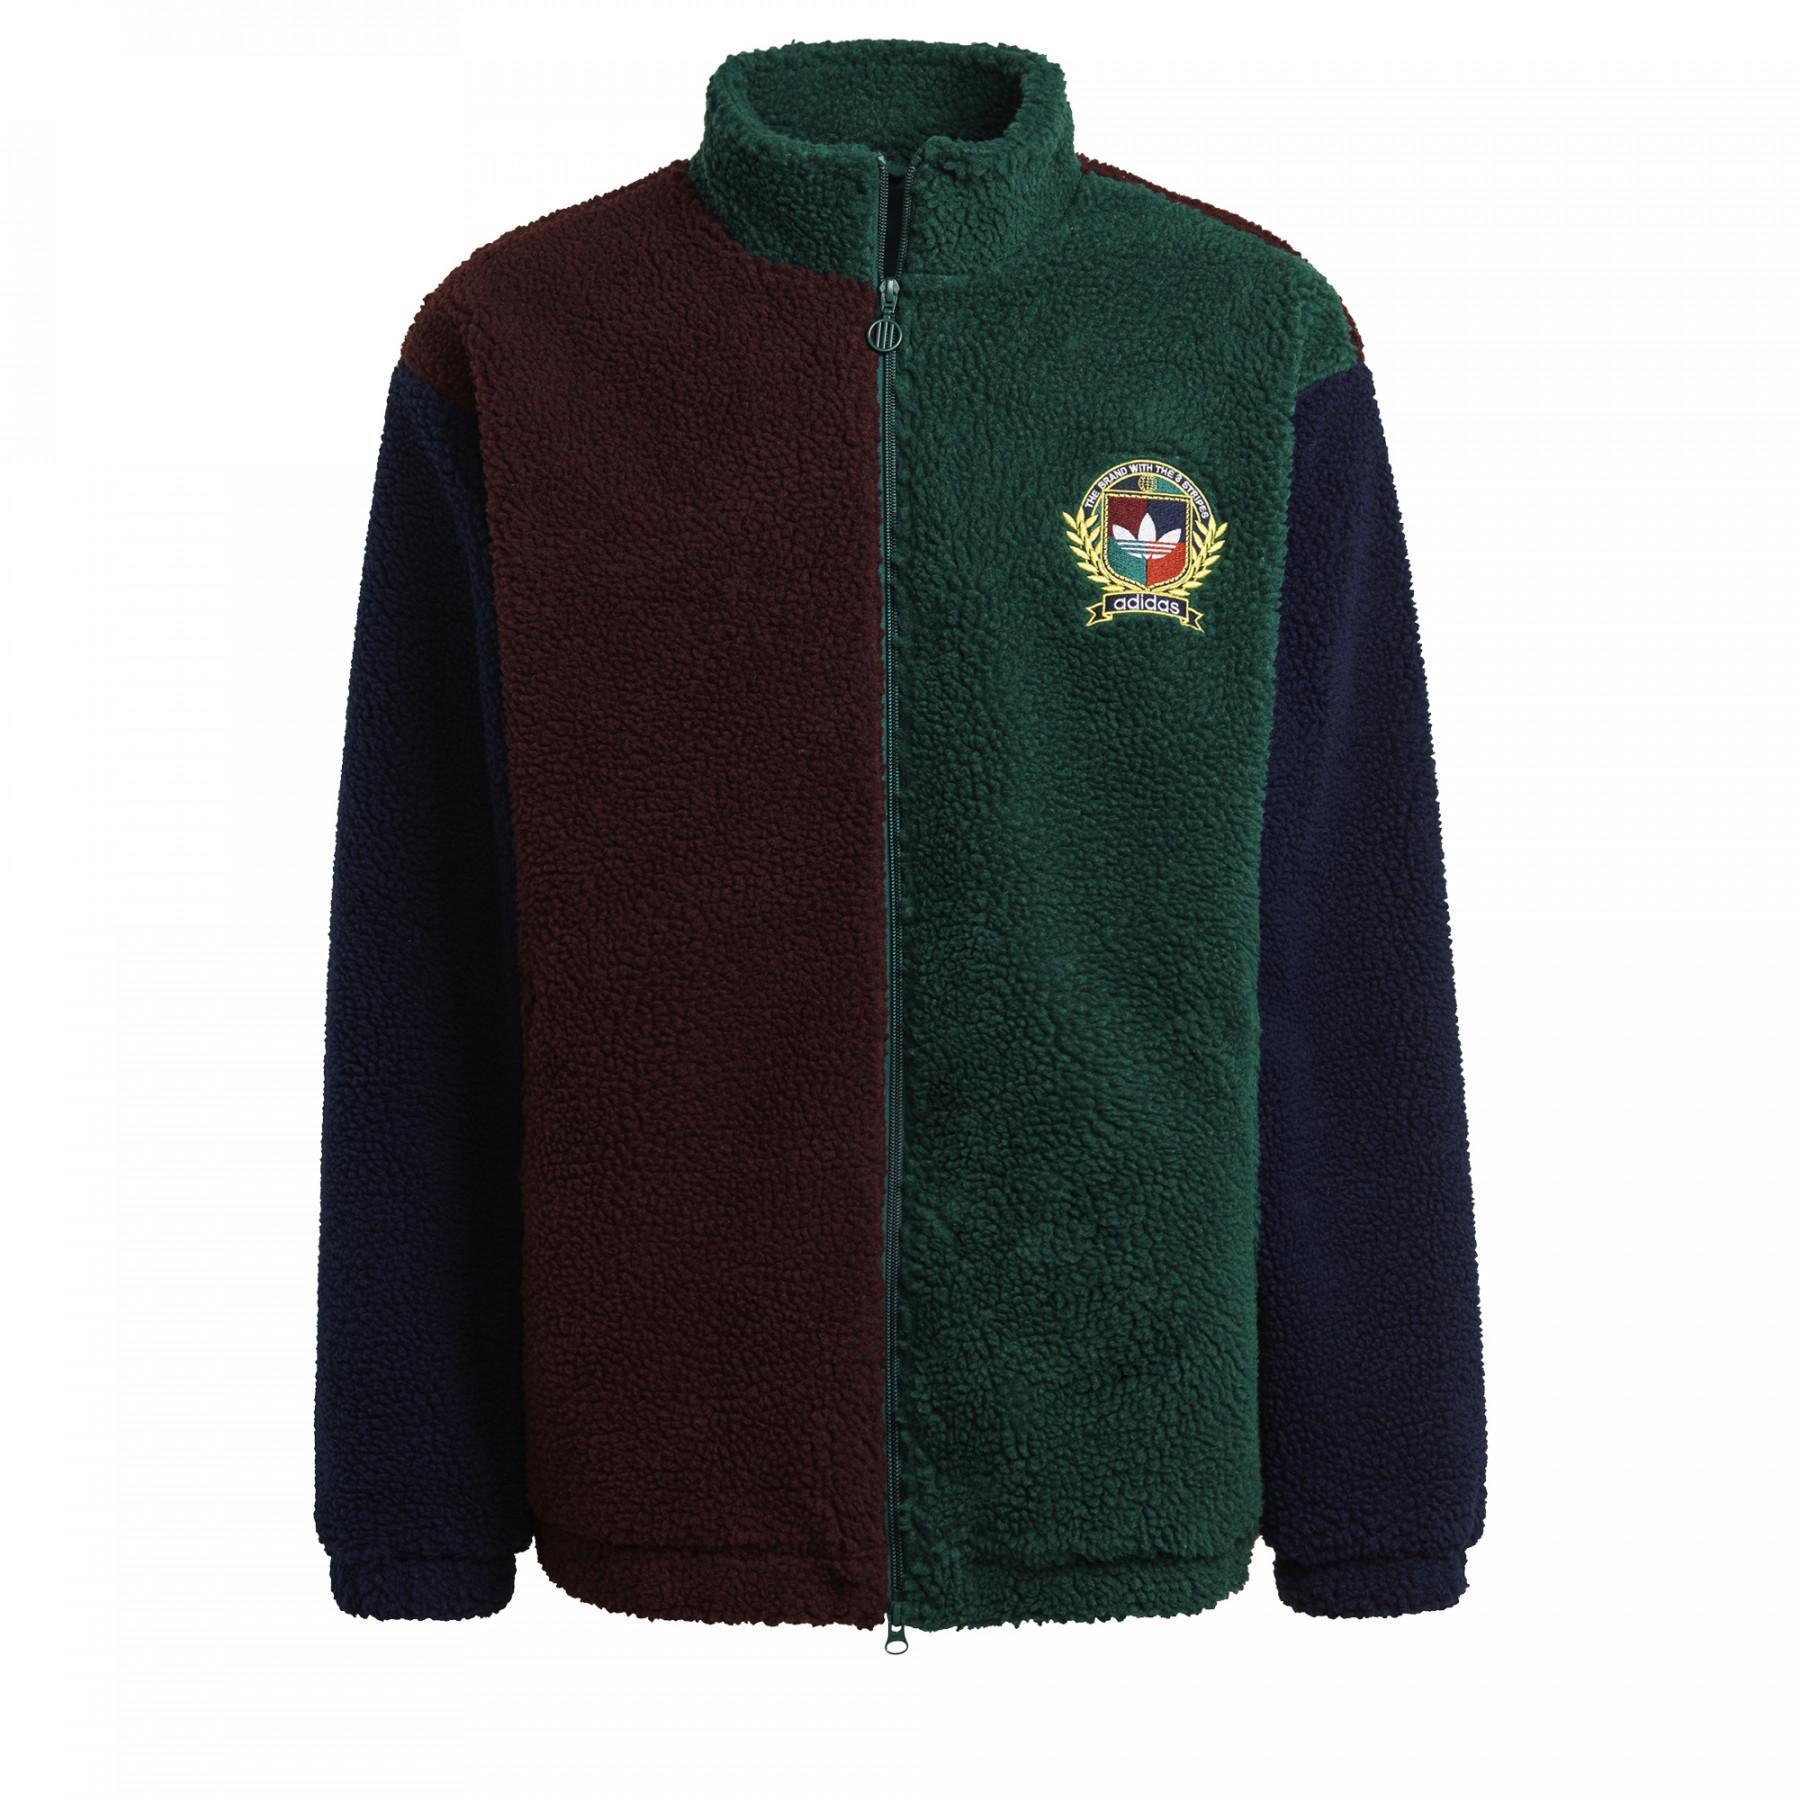 adidas Originals Collegiate Crest Zip Jacket